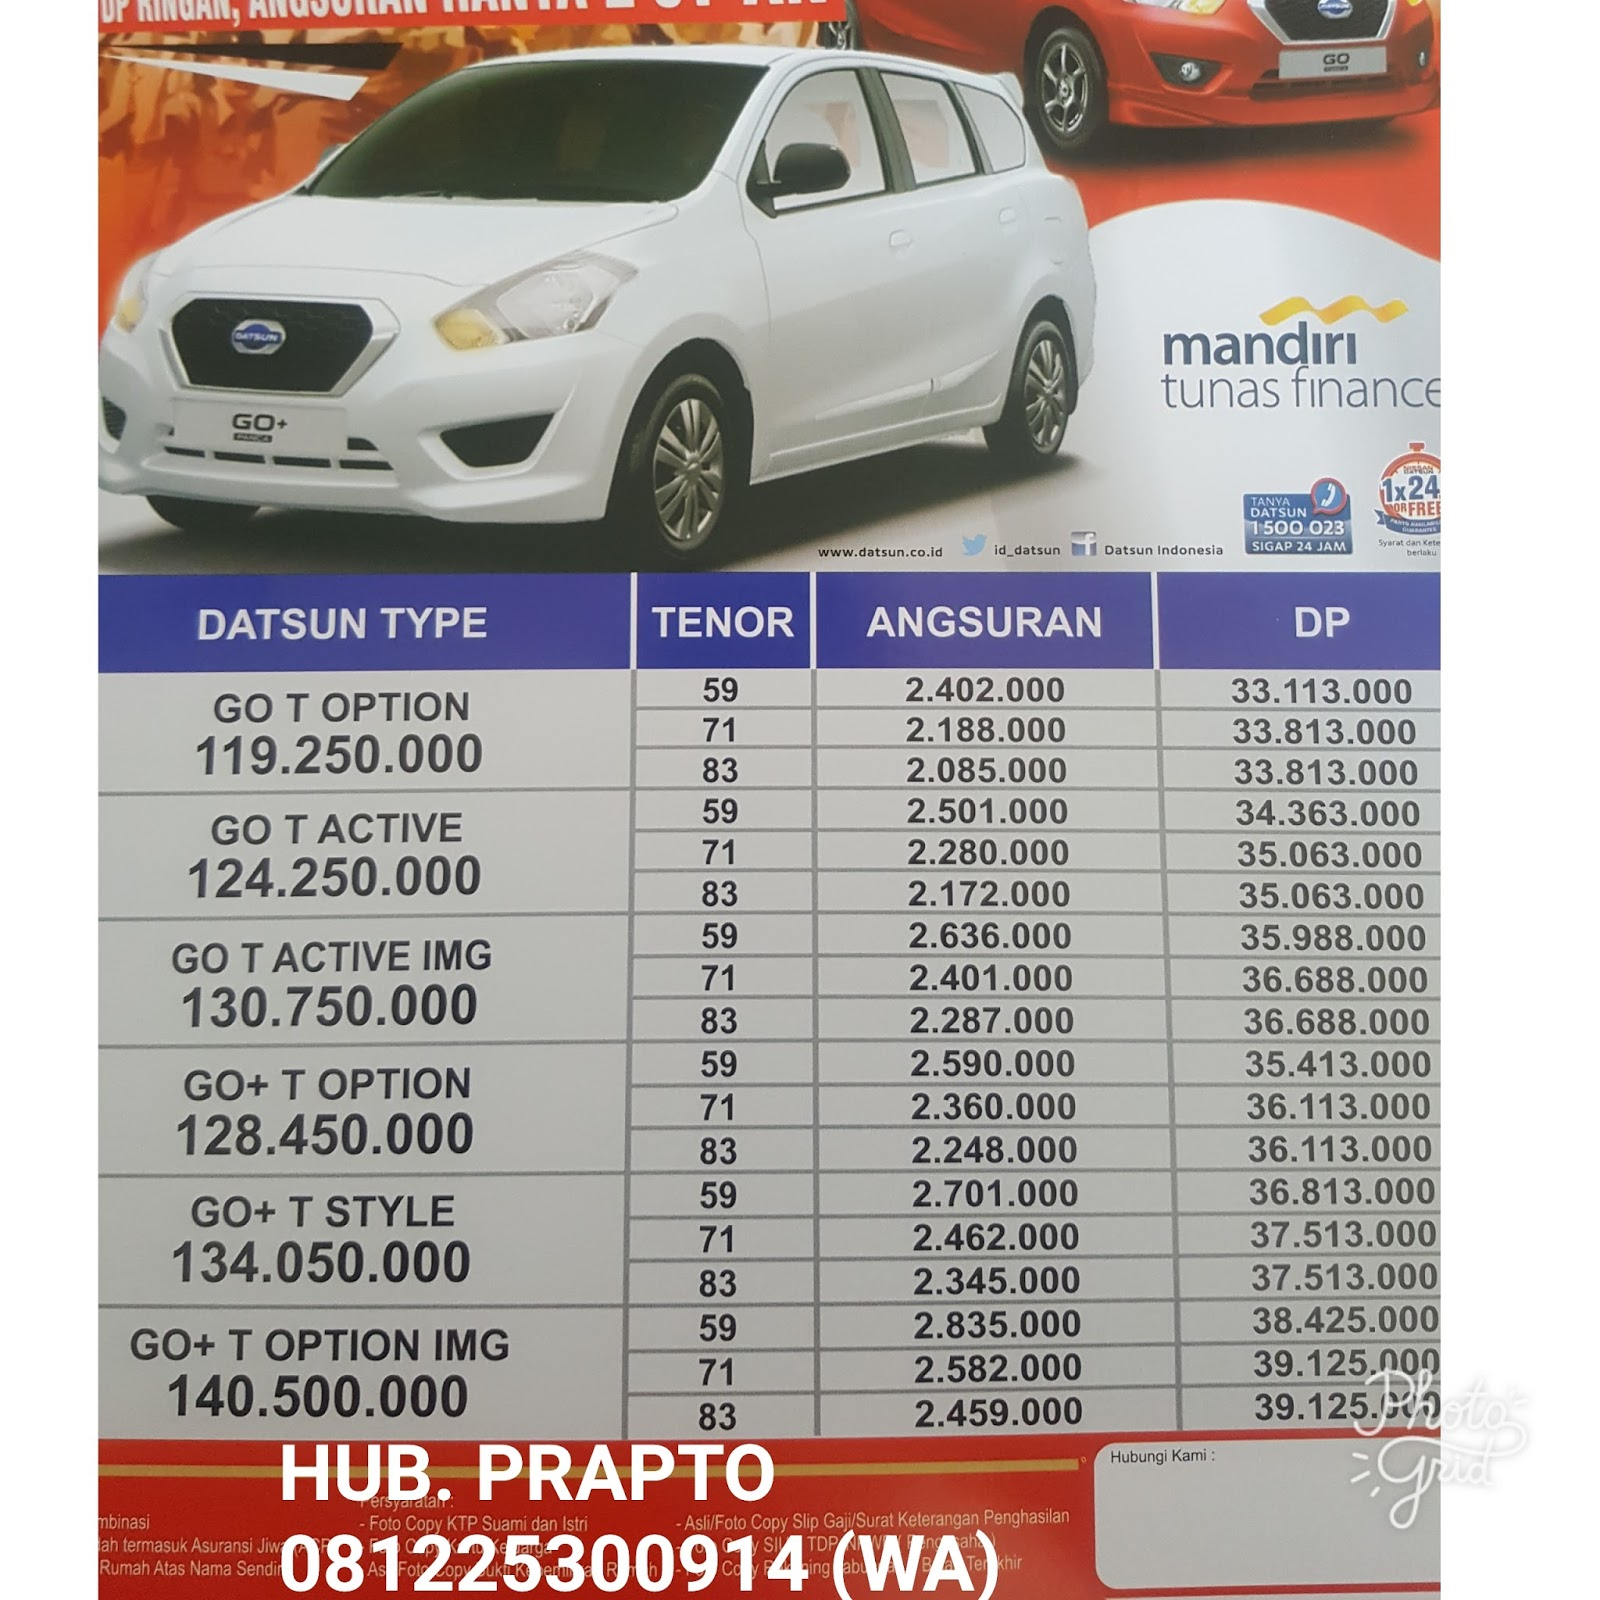 Harga Datsun Go PANCA, Go+ DP 7jt |081225300914 ~ DEALER ...